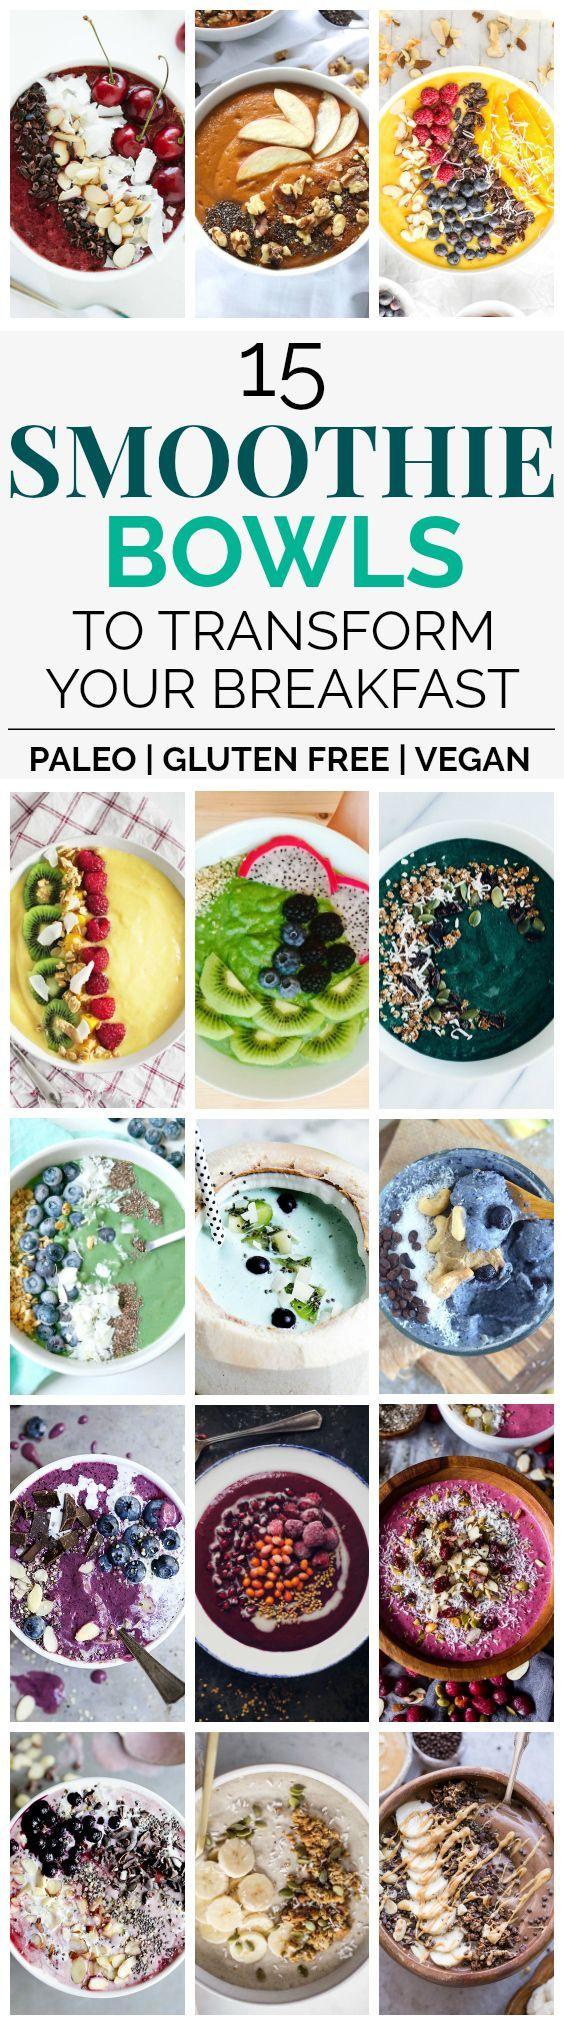 15 Paleo & Vegan Smoothie Bowl Recipes